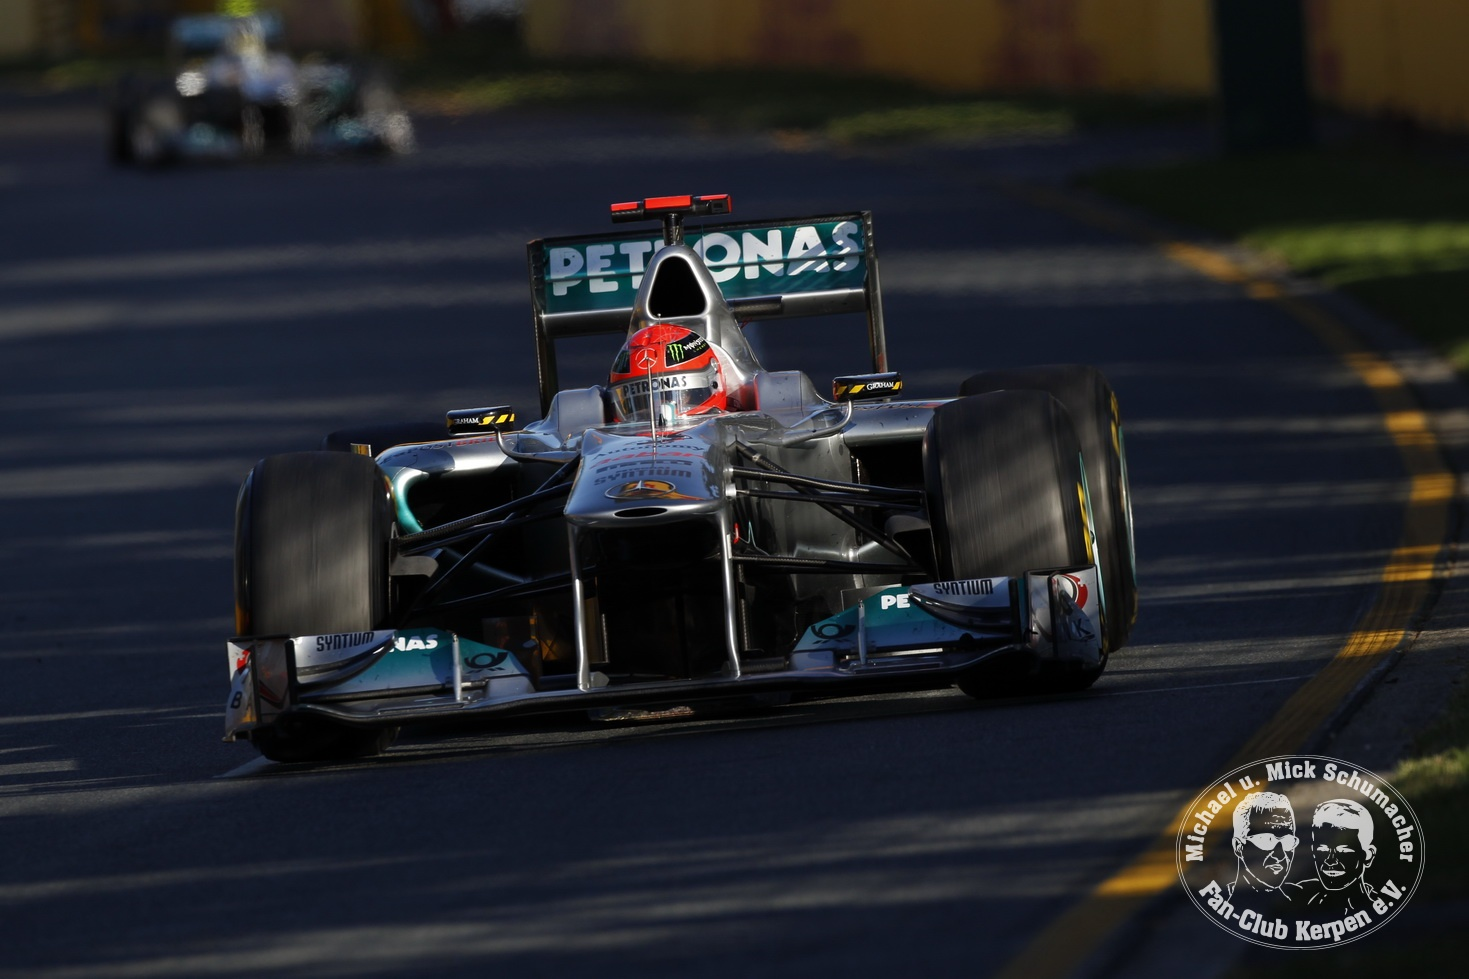 Formel 1, Grand Prix Australien 2011, Melbourne, 27.03.2011